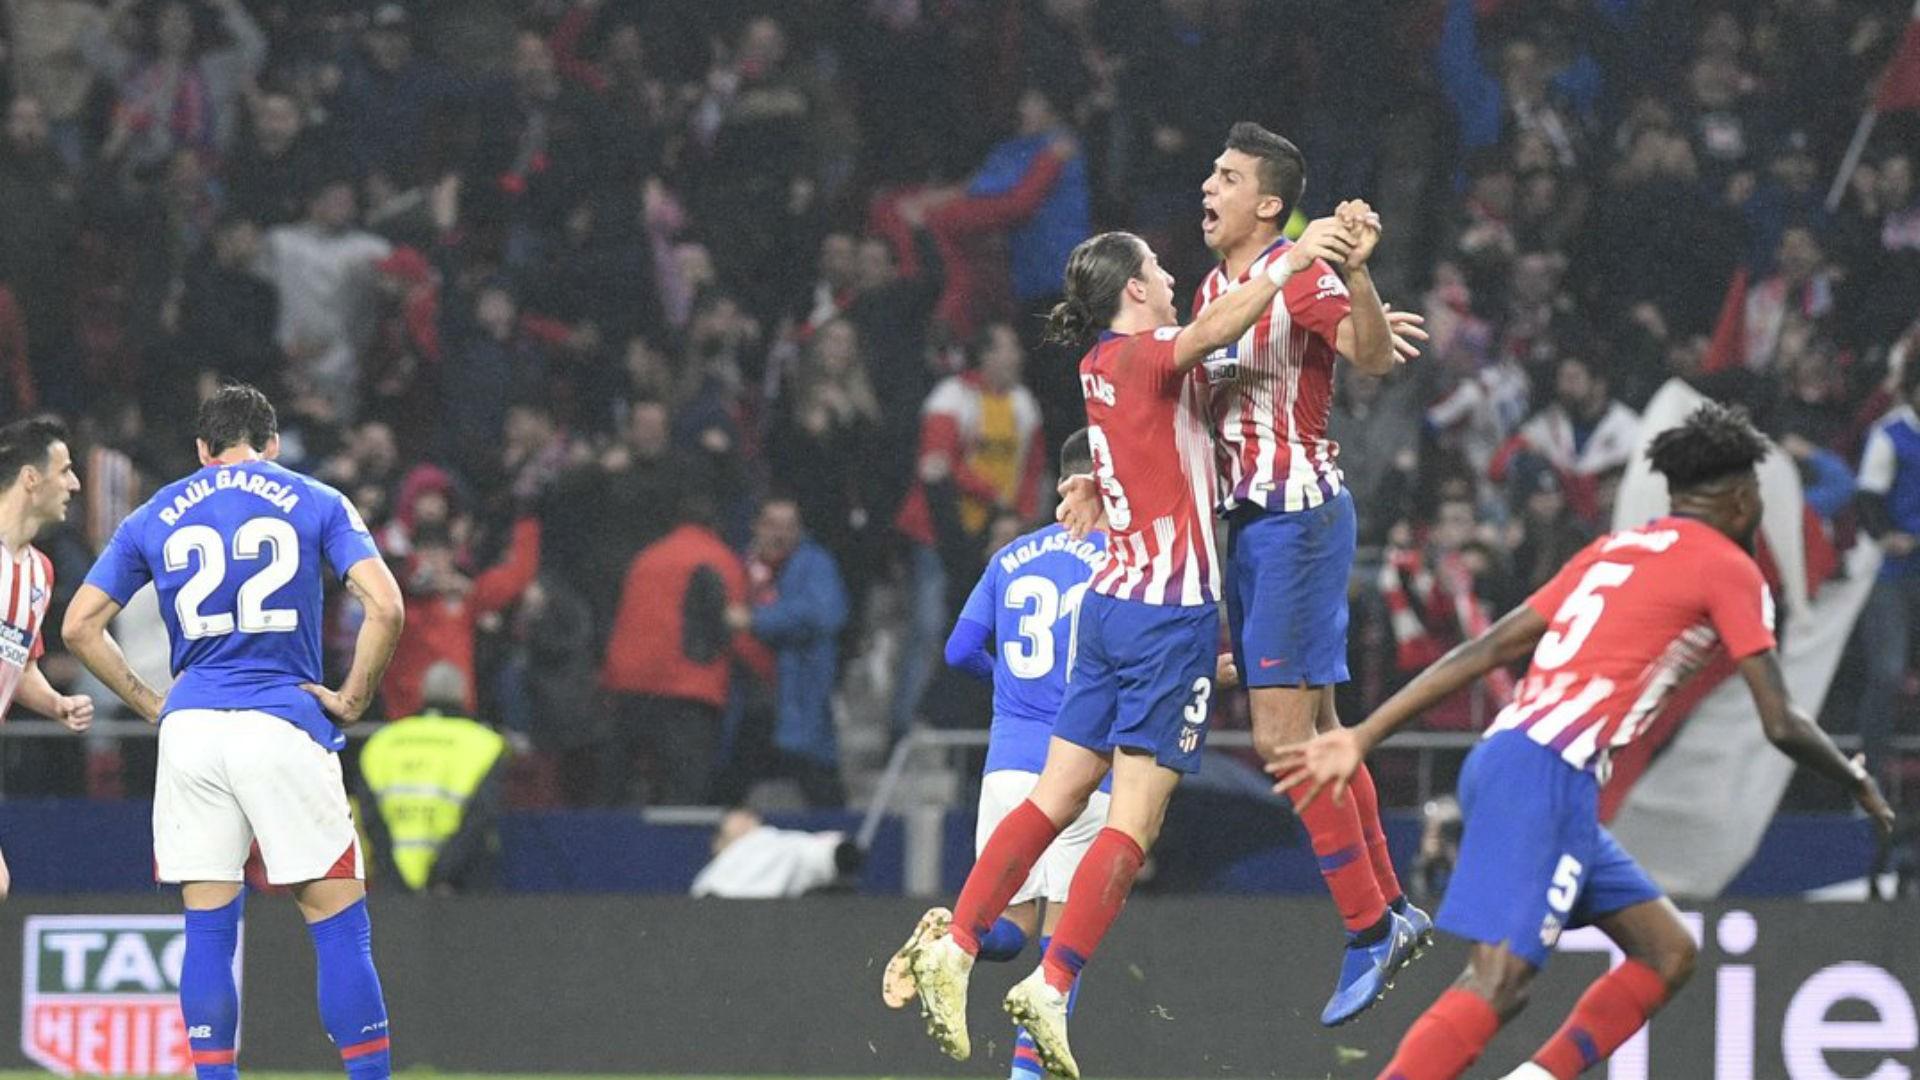 rodrigo cropped kui5uoztc2w0132gpw10p1fpl - Atletico Madrid 3-2 Athletic Bilbao [LaLiga Highlights] [Watch]